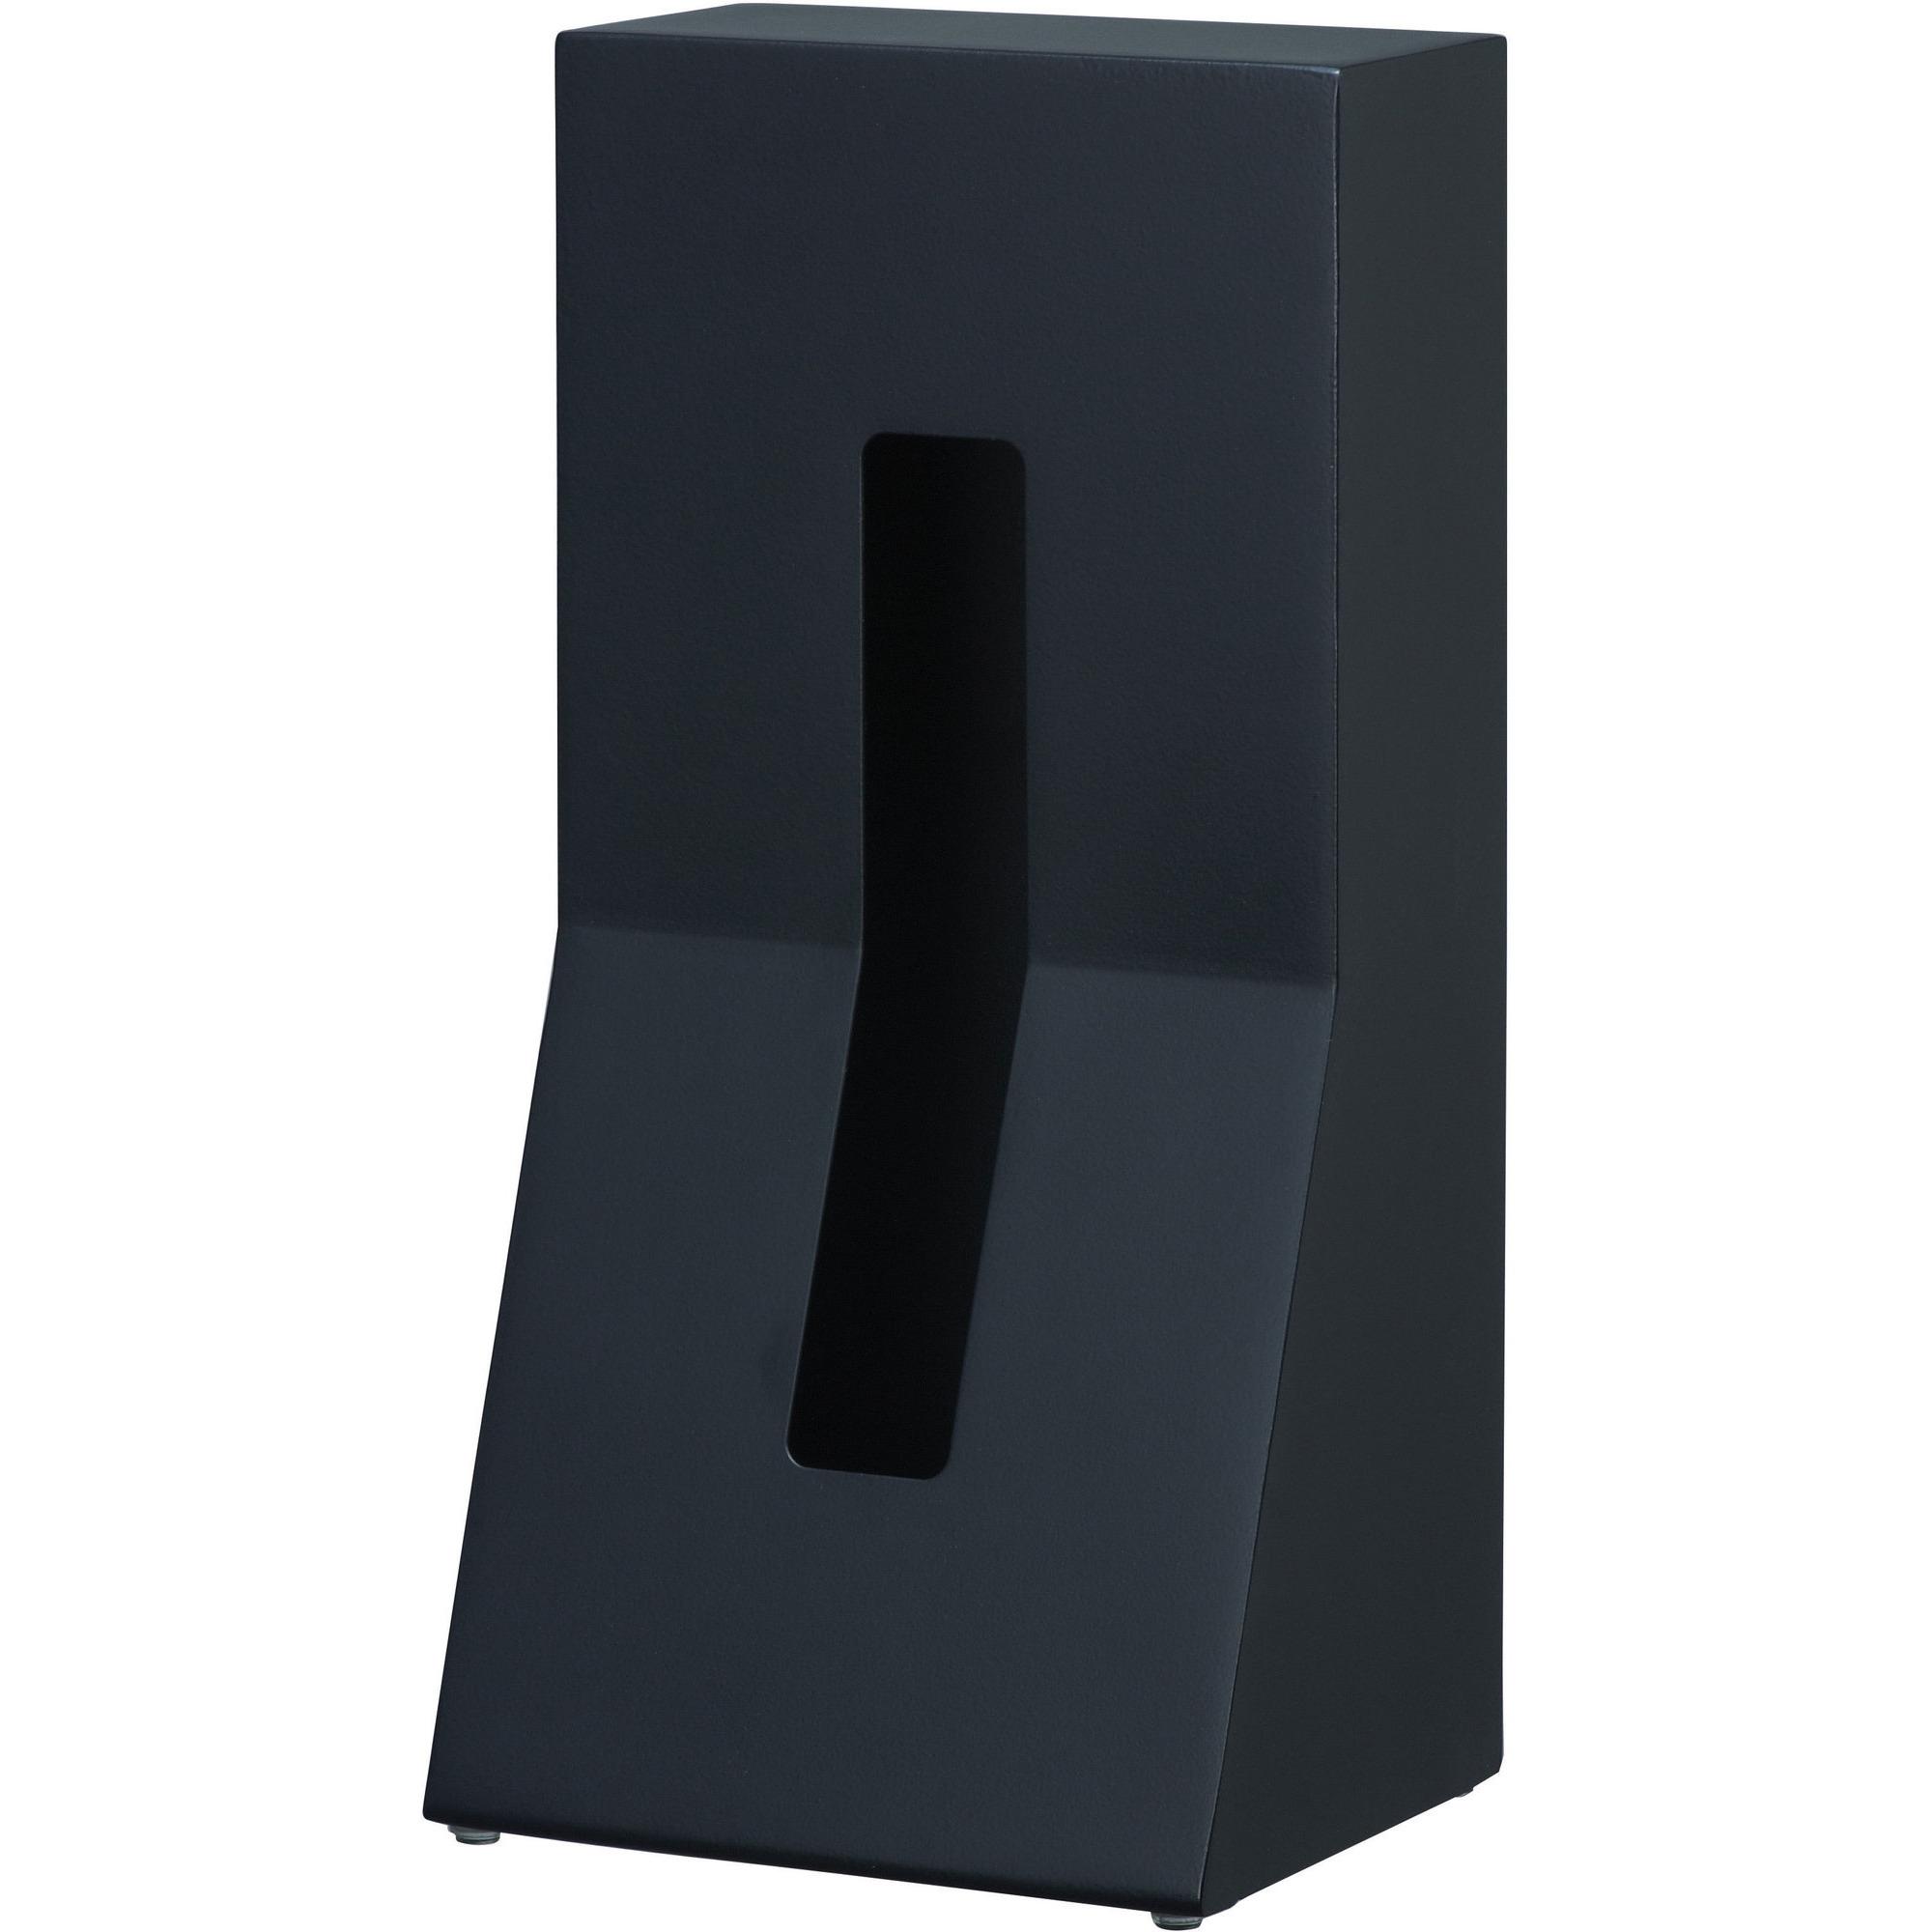 Duende Stand stål servetthållare svart